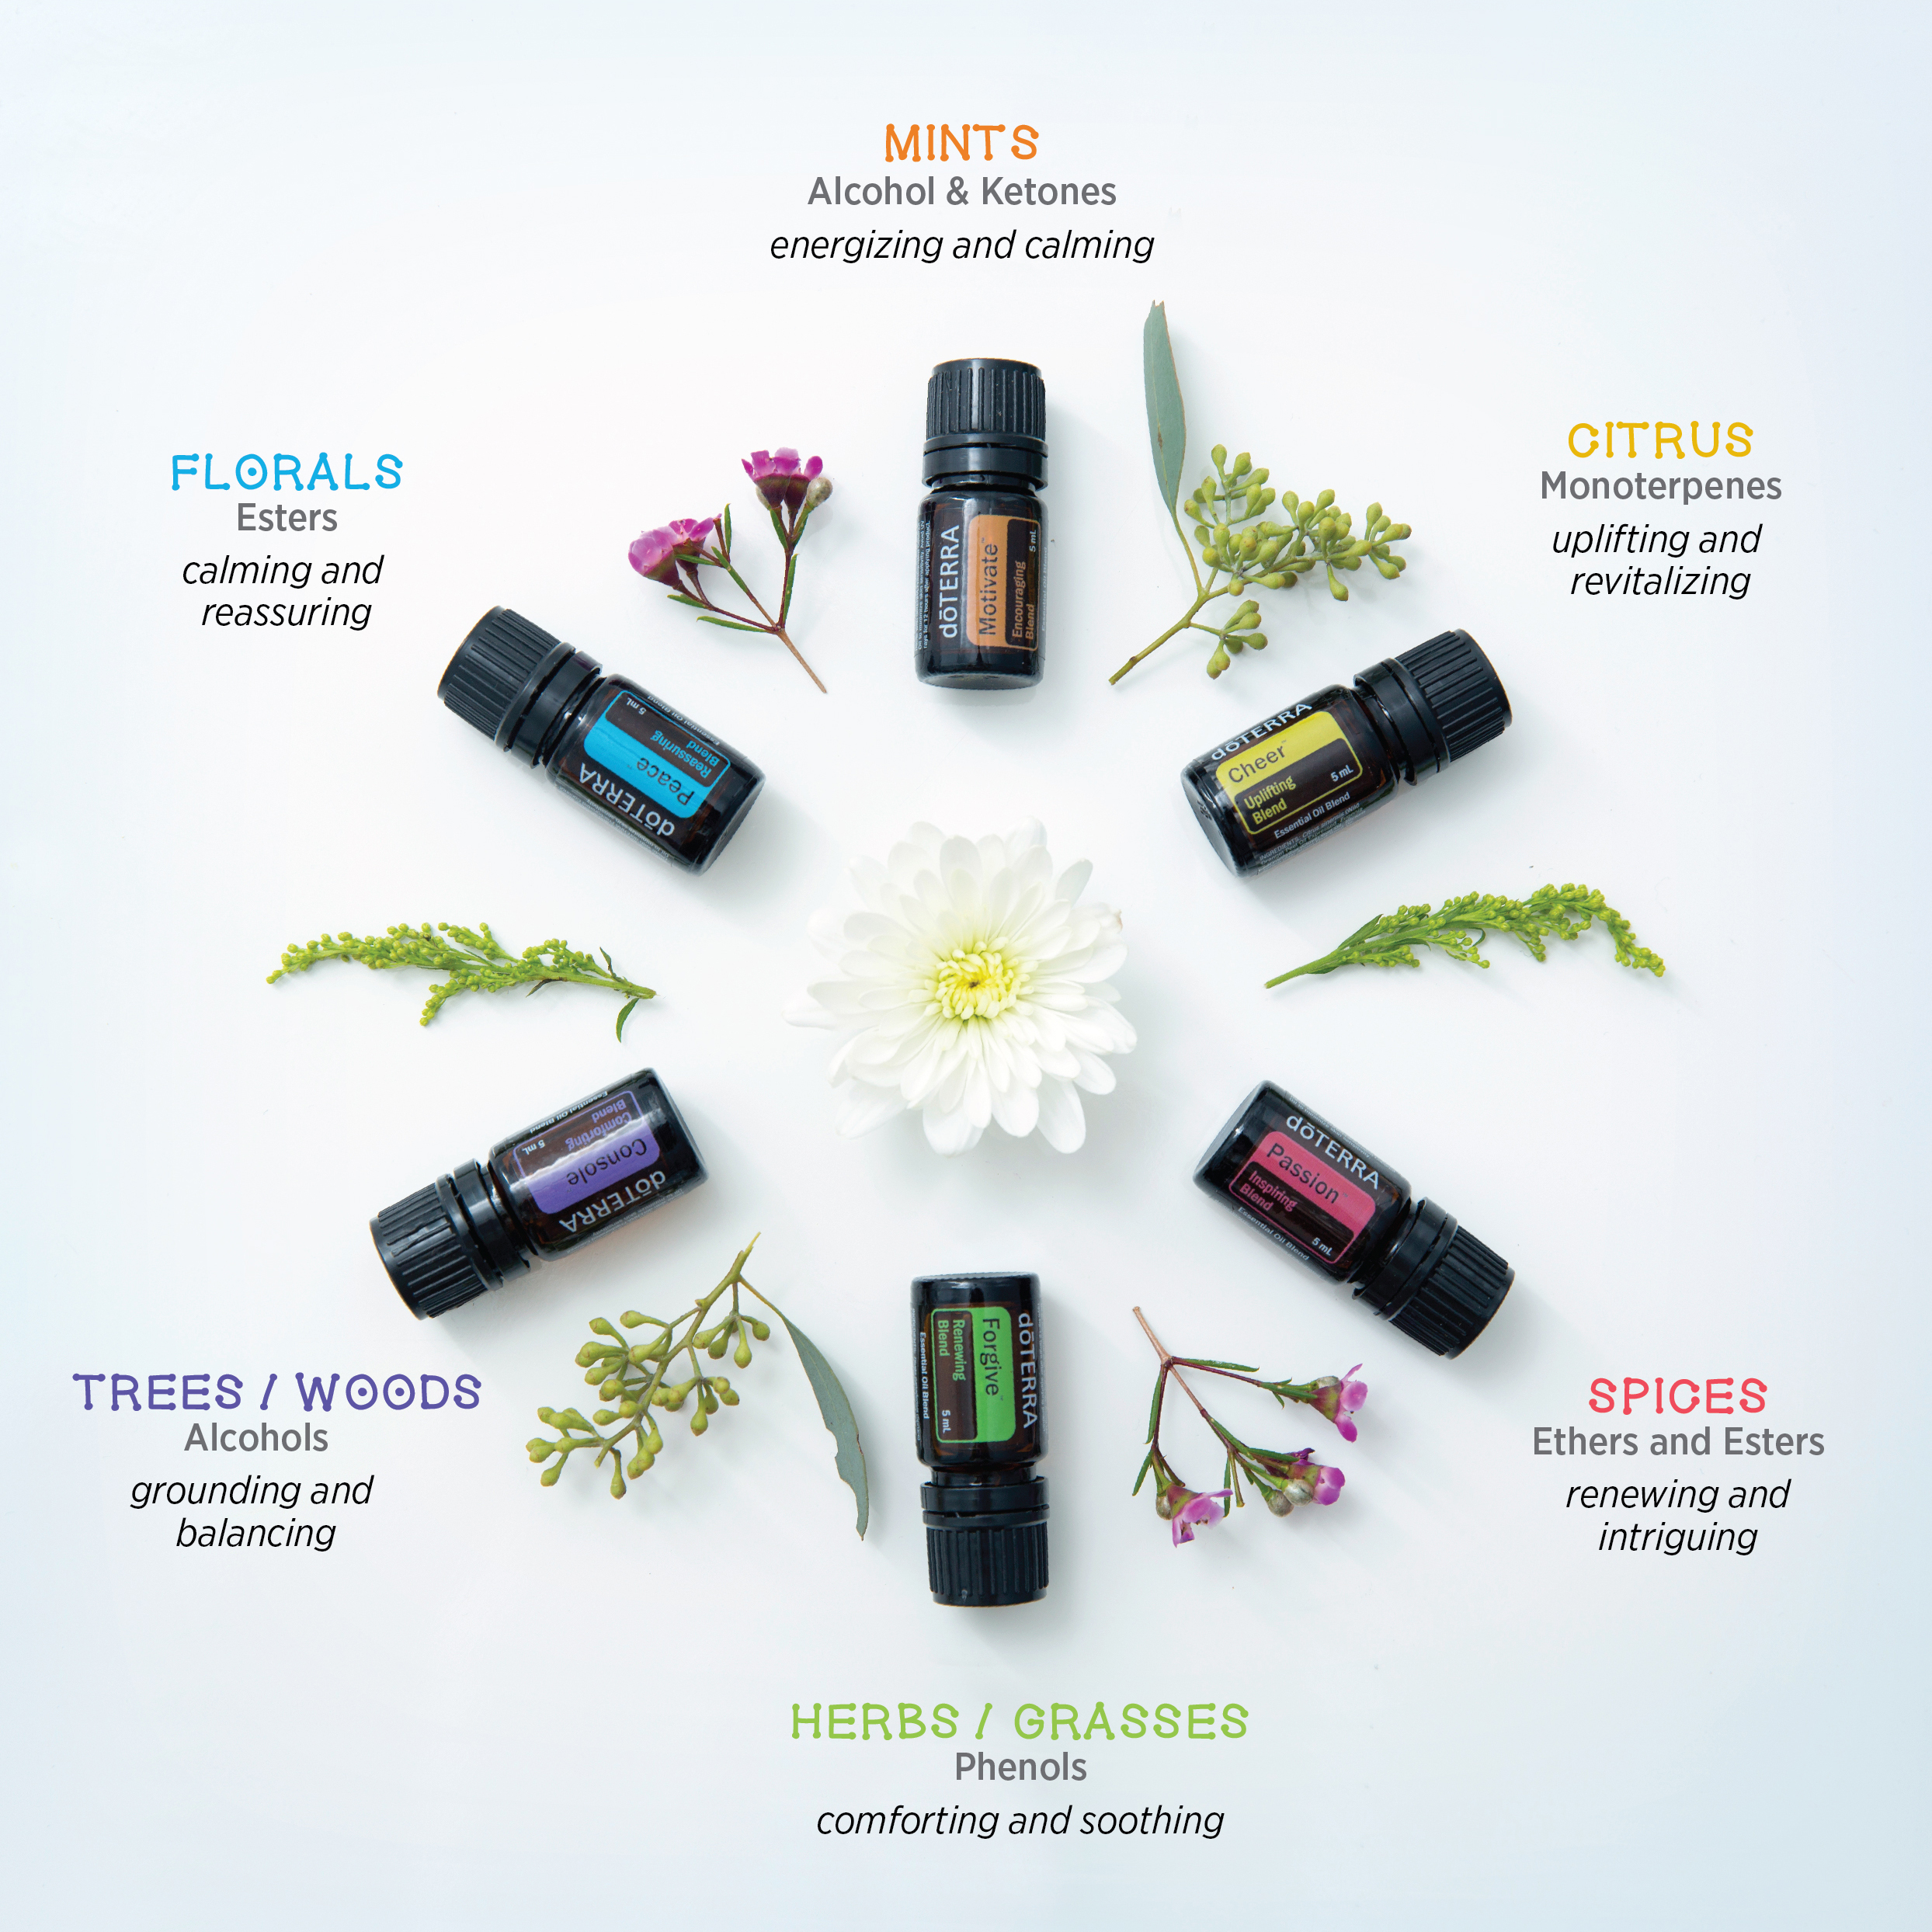 aromatherapy-infographic.jpg